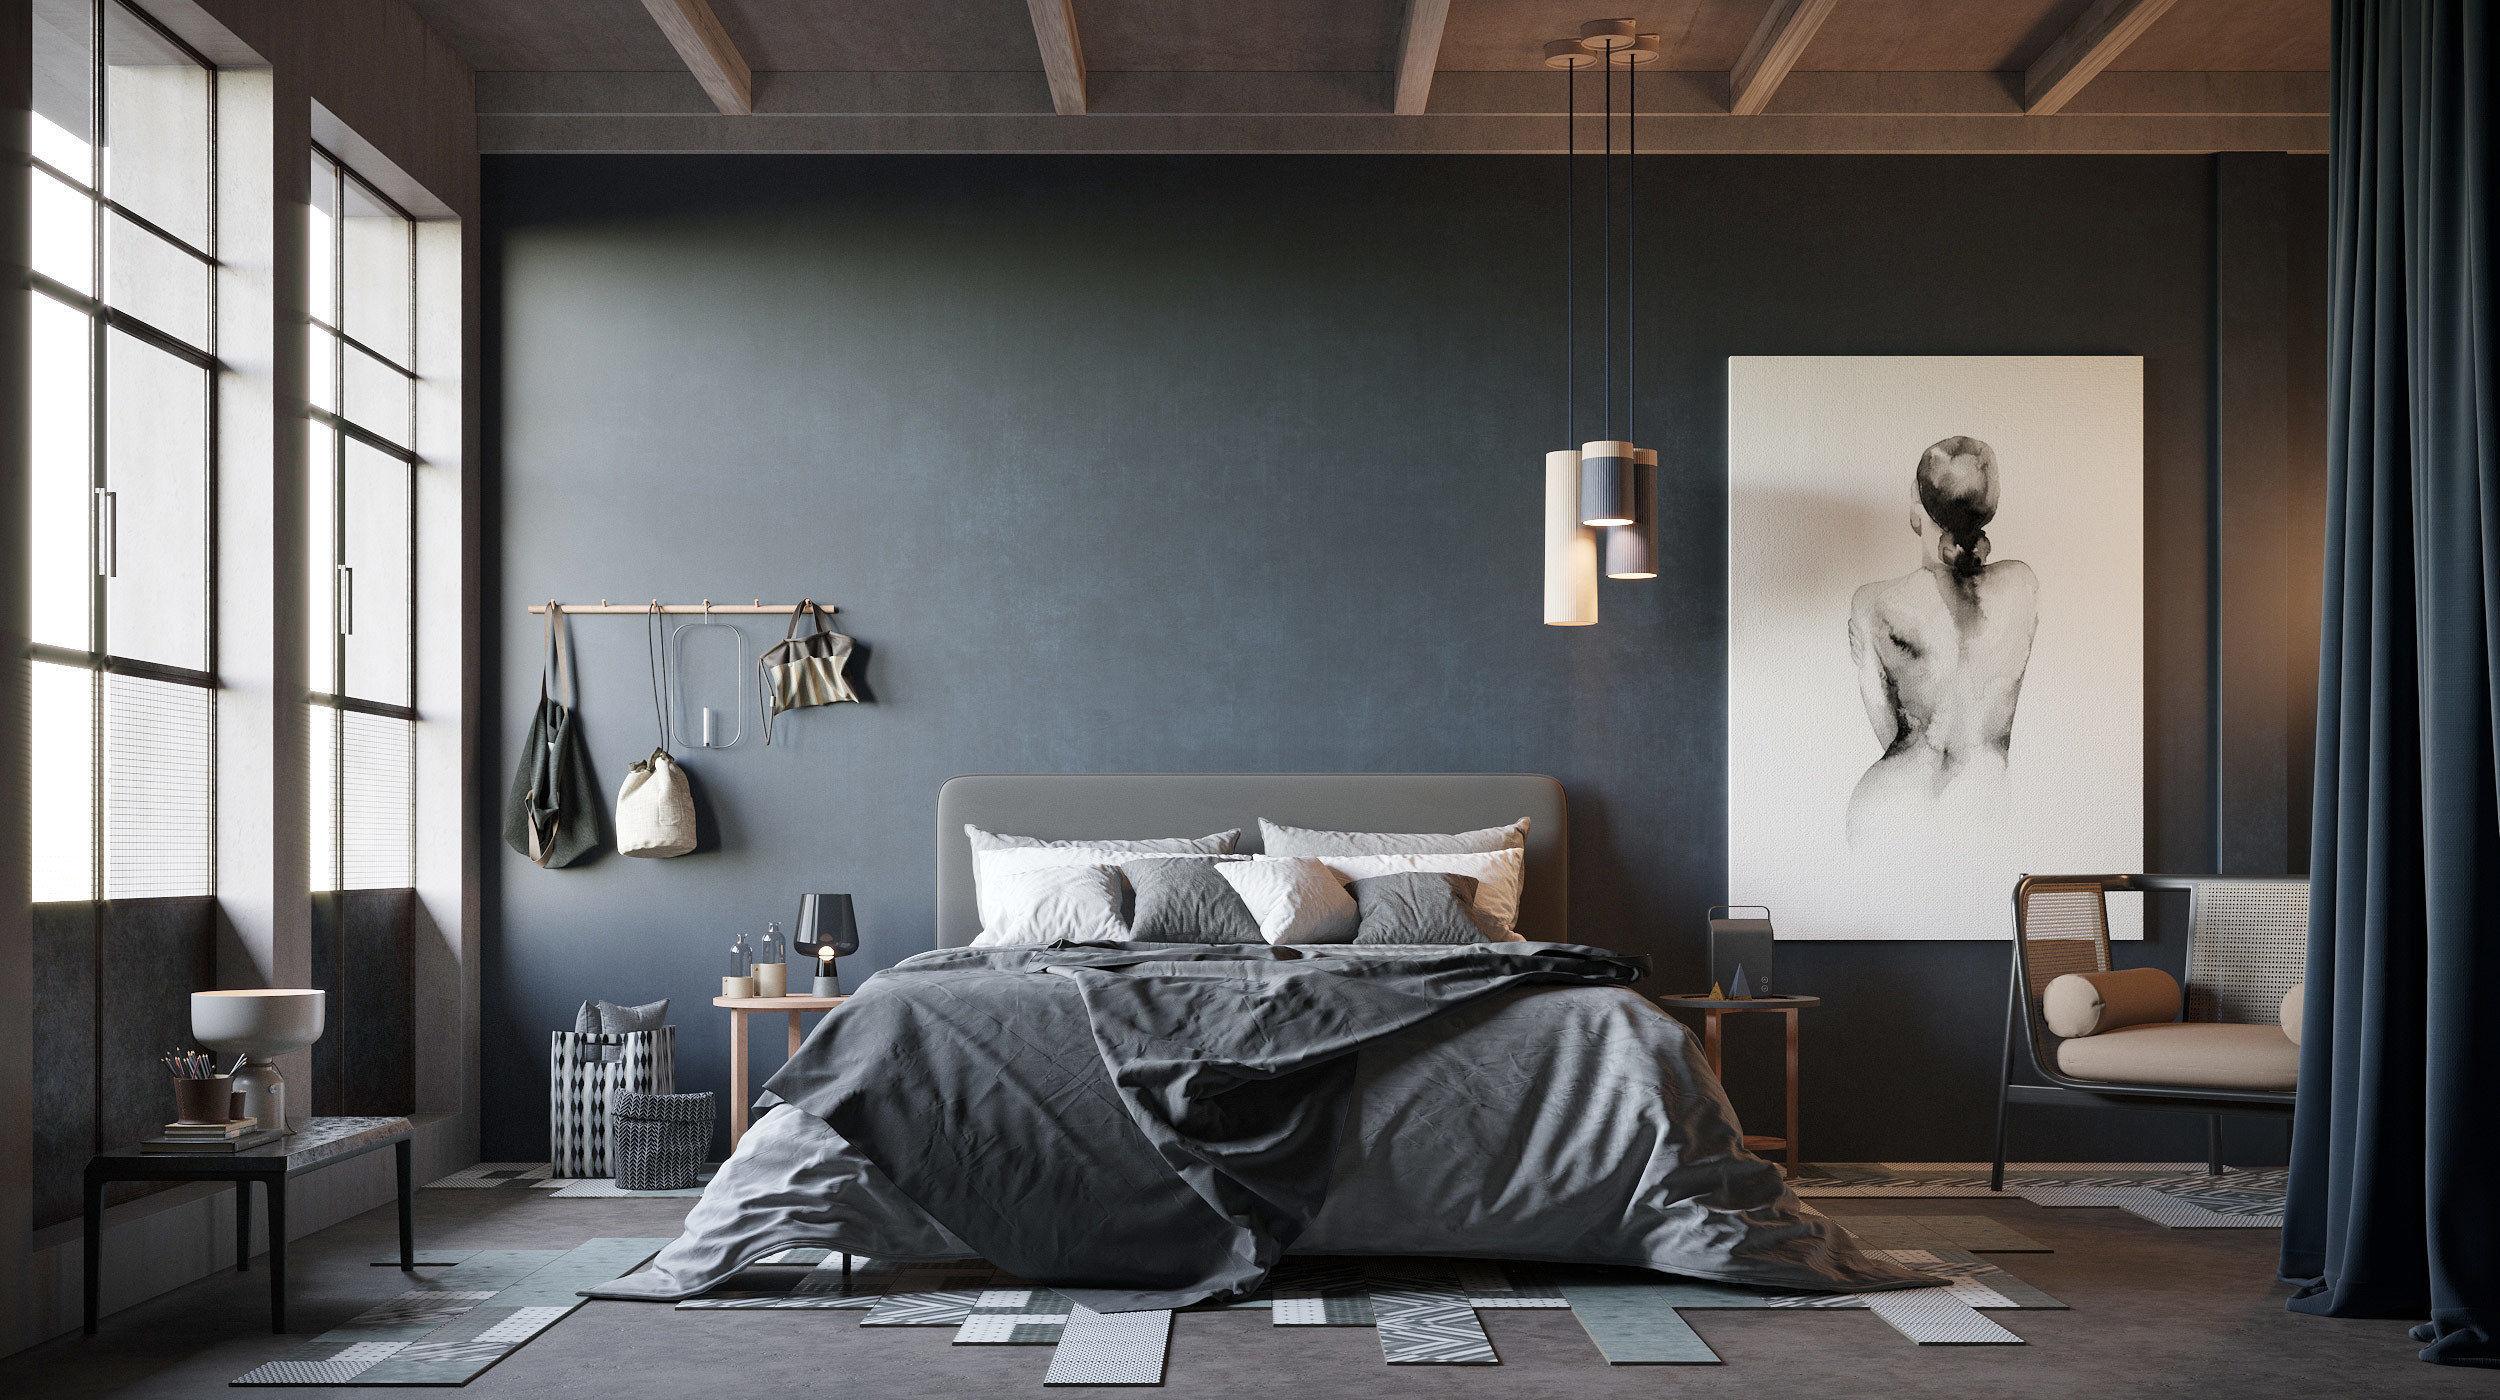 Cozy Bedroom interior scene